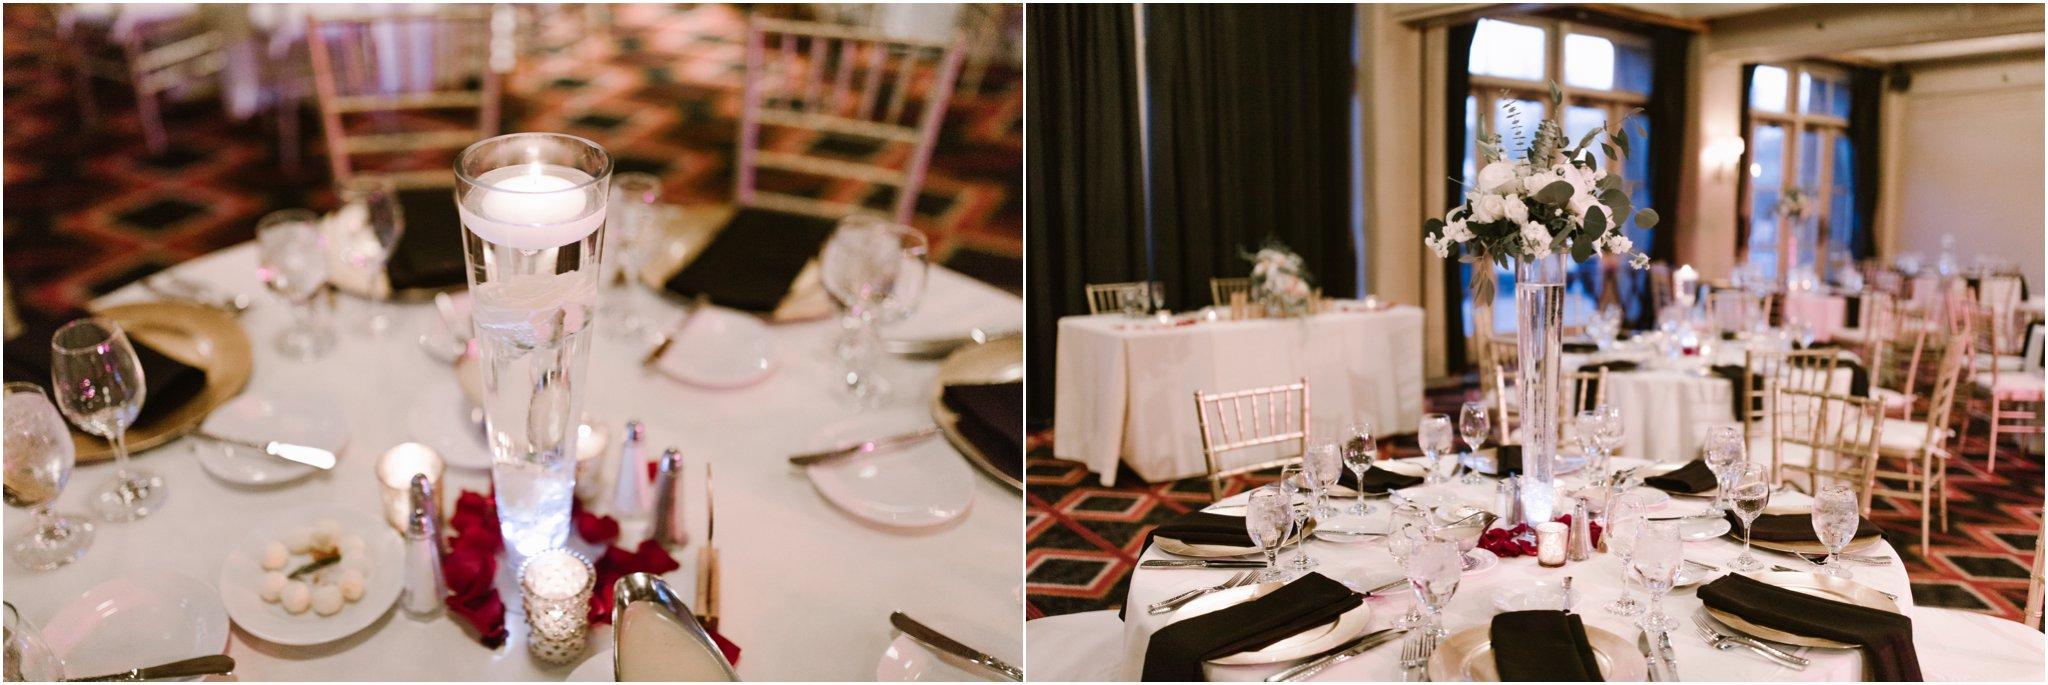 0929Loretto Chapel Wedding, Inn and Spa at Loretto wedding, Santa Fe wedding photographers, blue rose photography